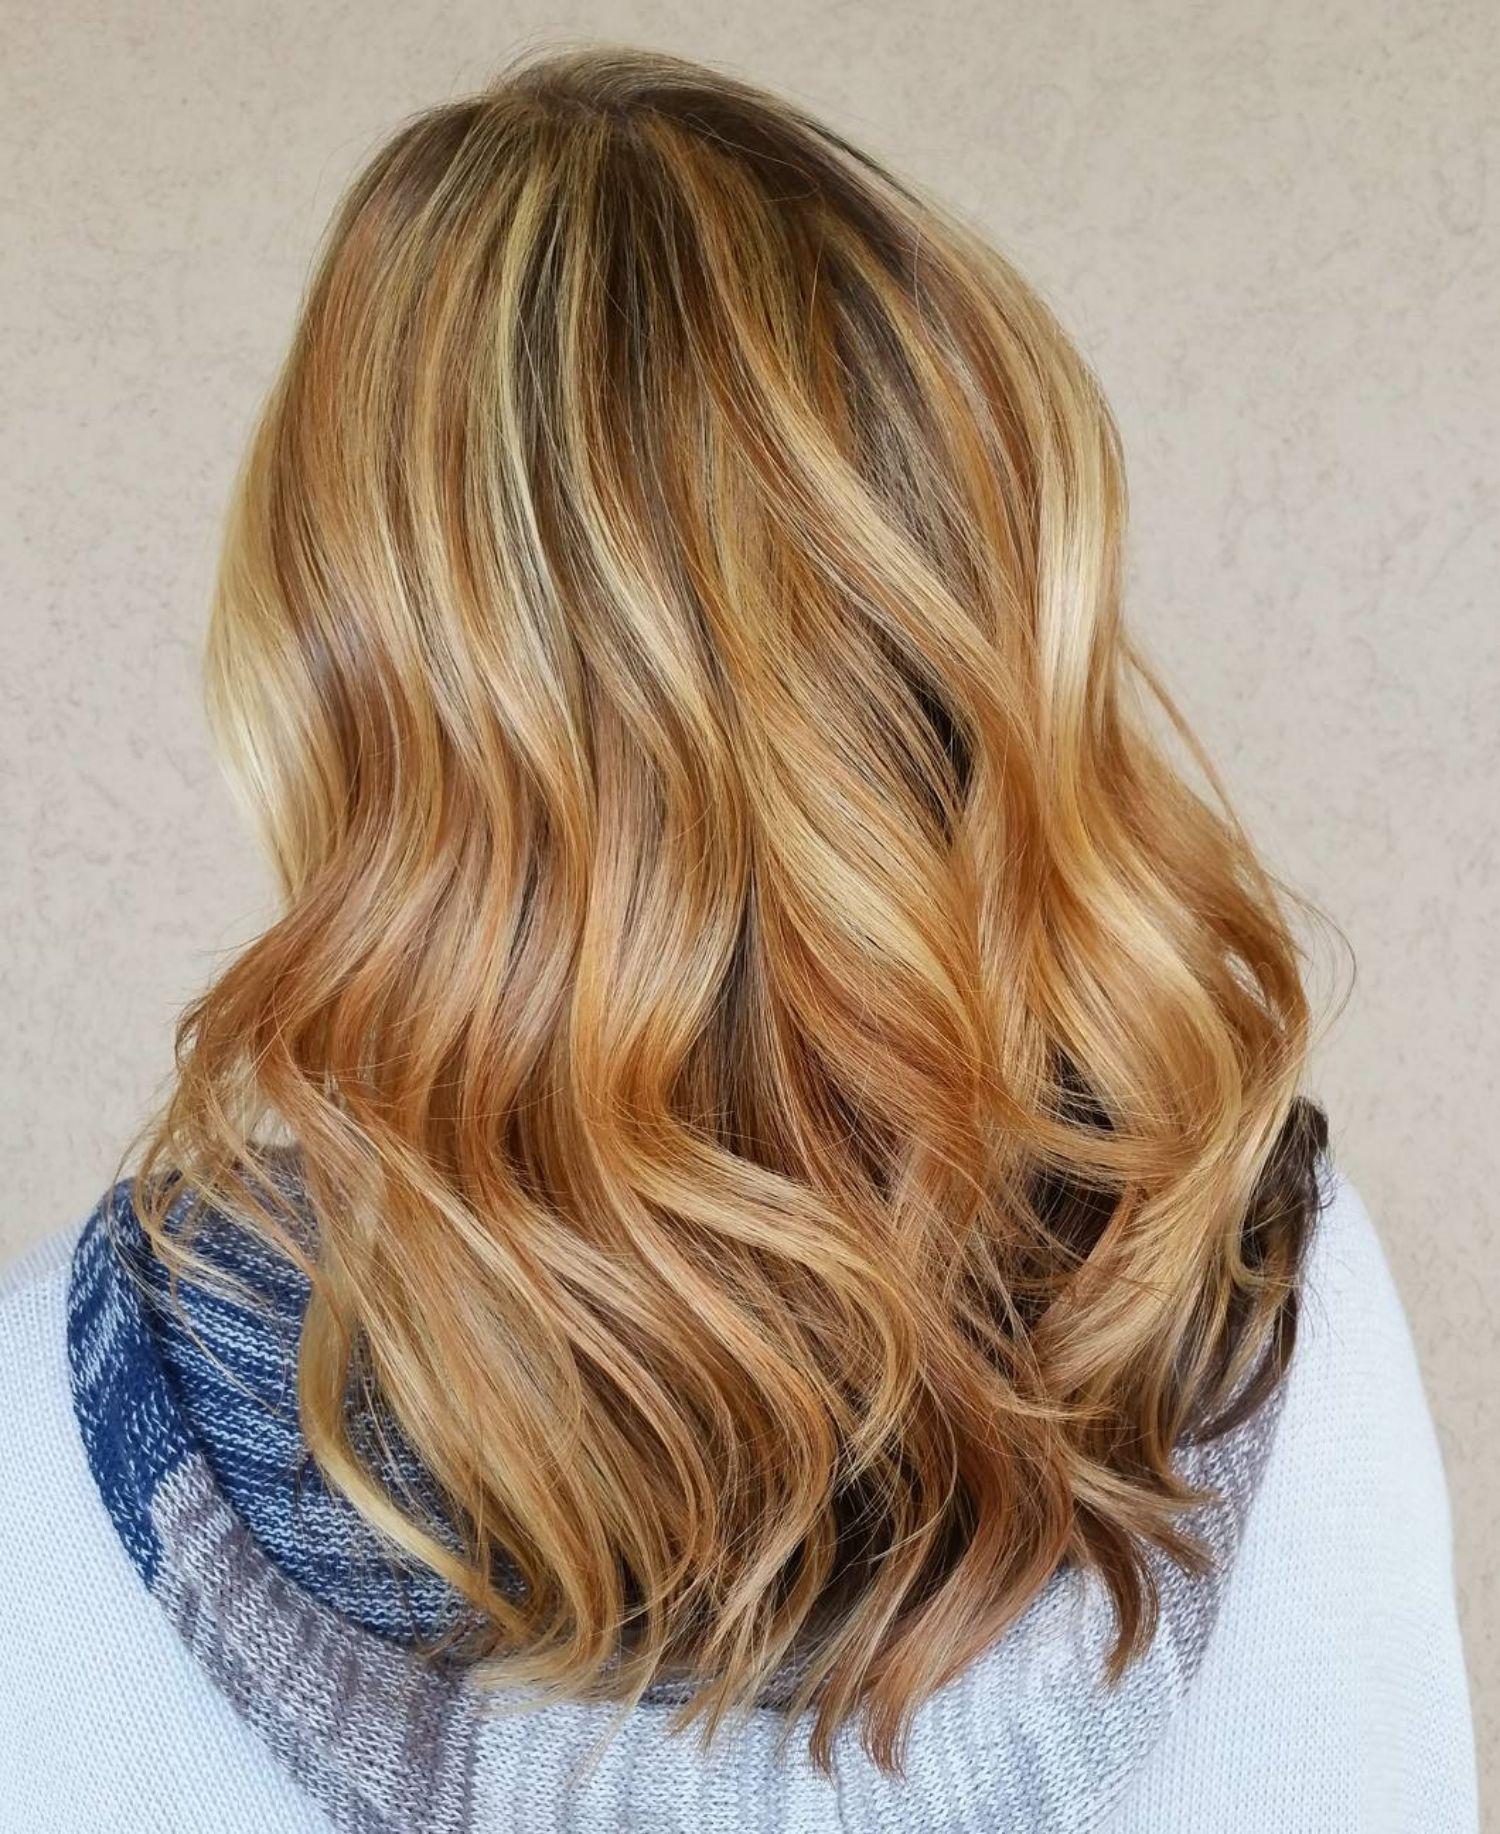 Strawberry Blonde Hair With Dark Underlayers Strawberry Blonde Hair Red Blonde Hair Strawberry Blonde Hair Color